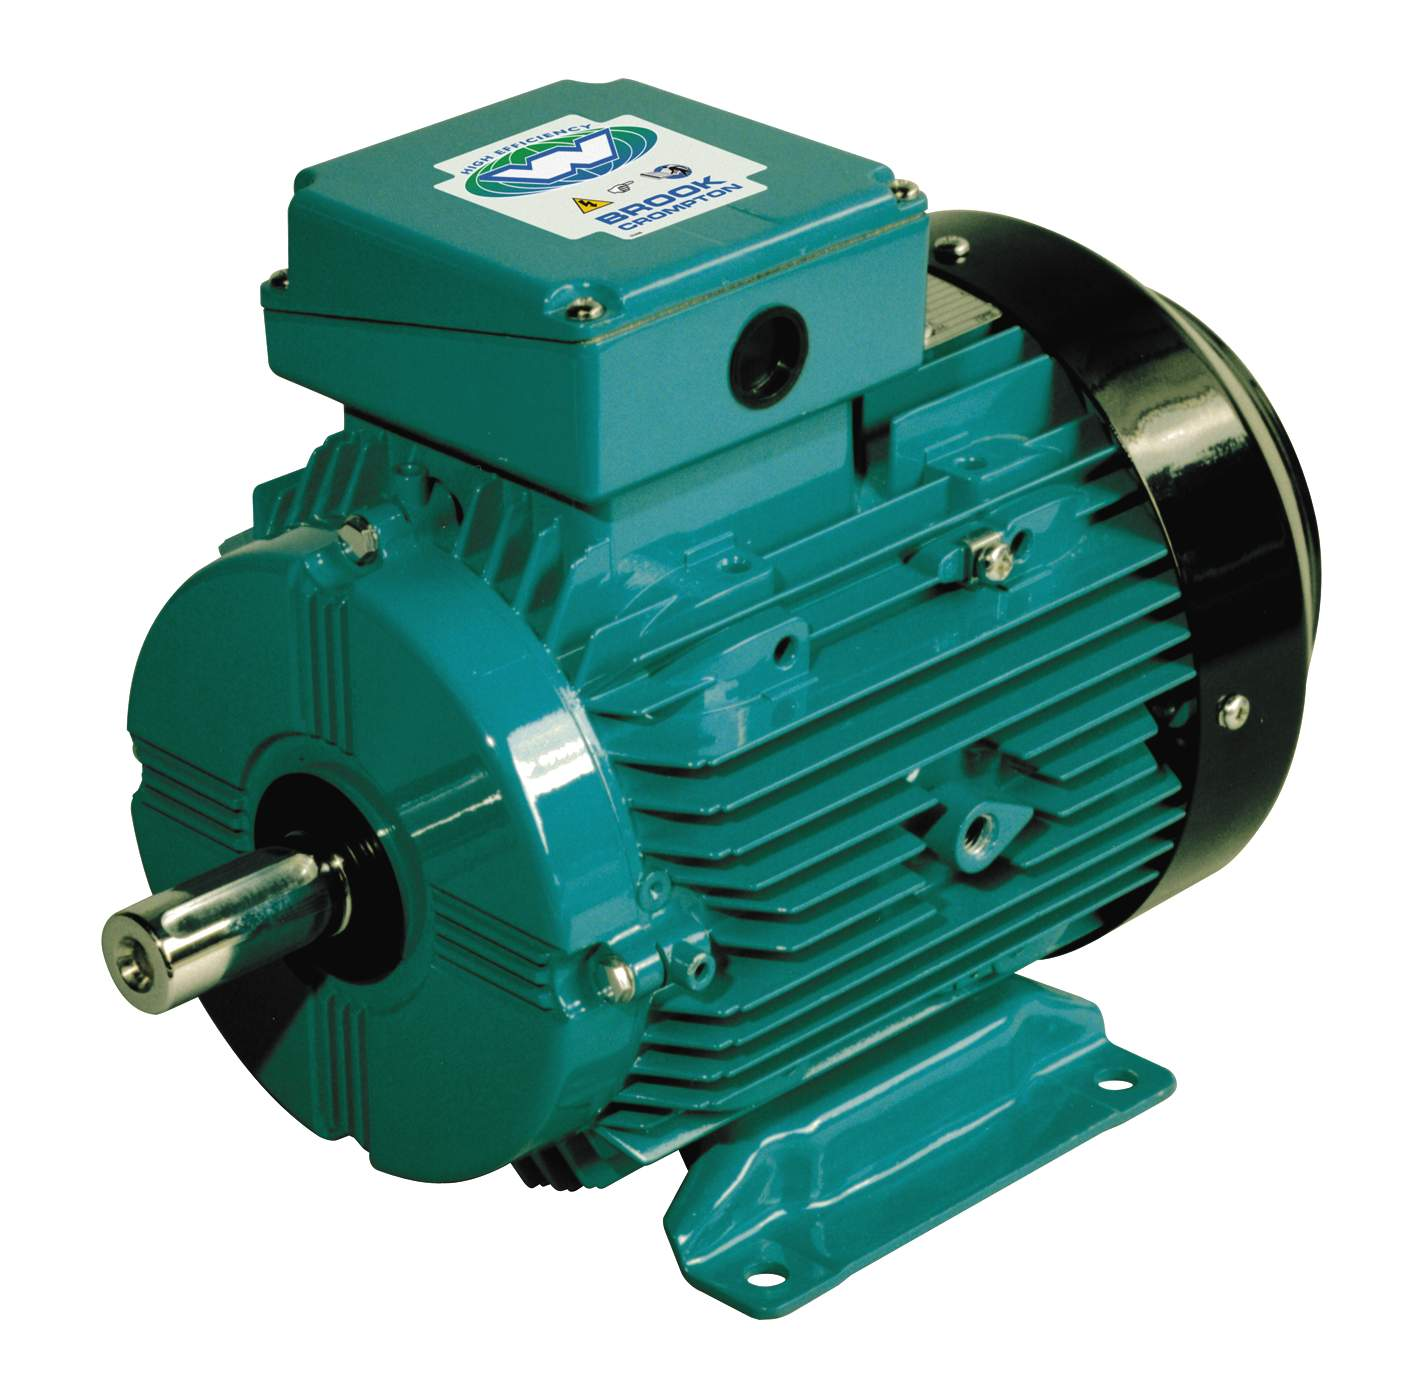 1 2 Hp 375 Watt Electrical Motor Preston And Thomas Spares